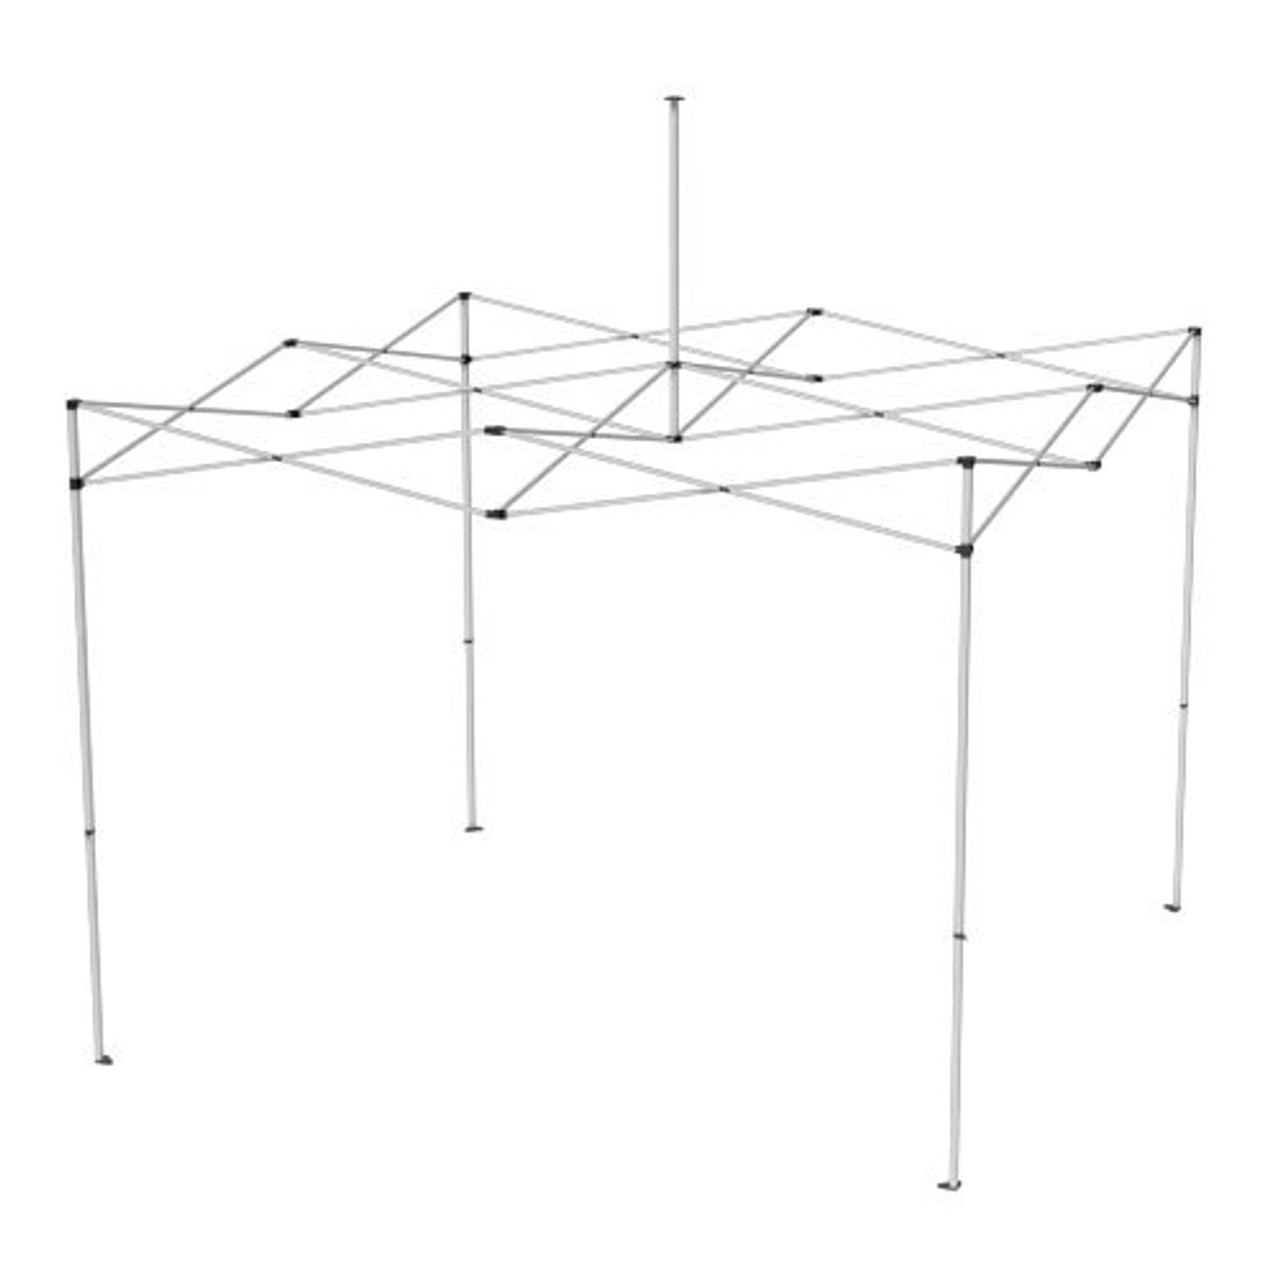 Canopy Frames